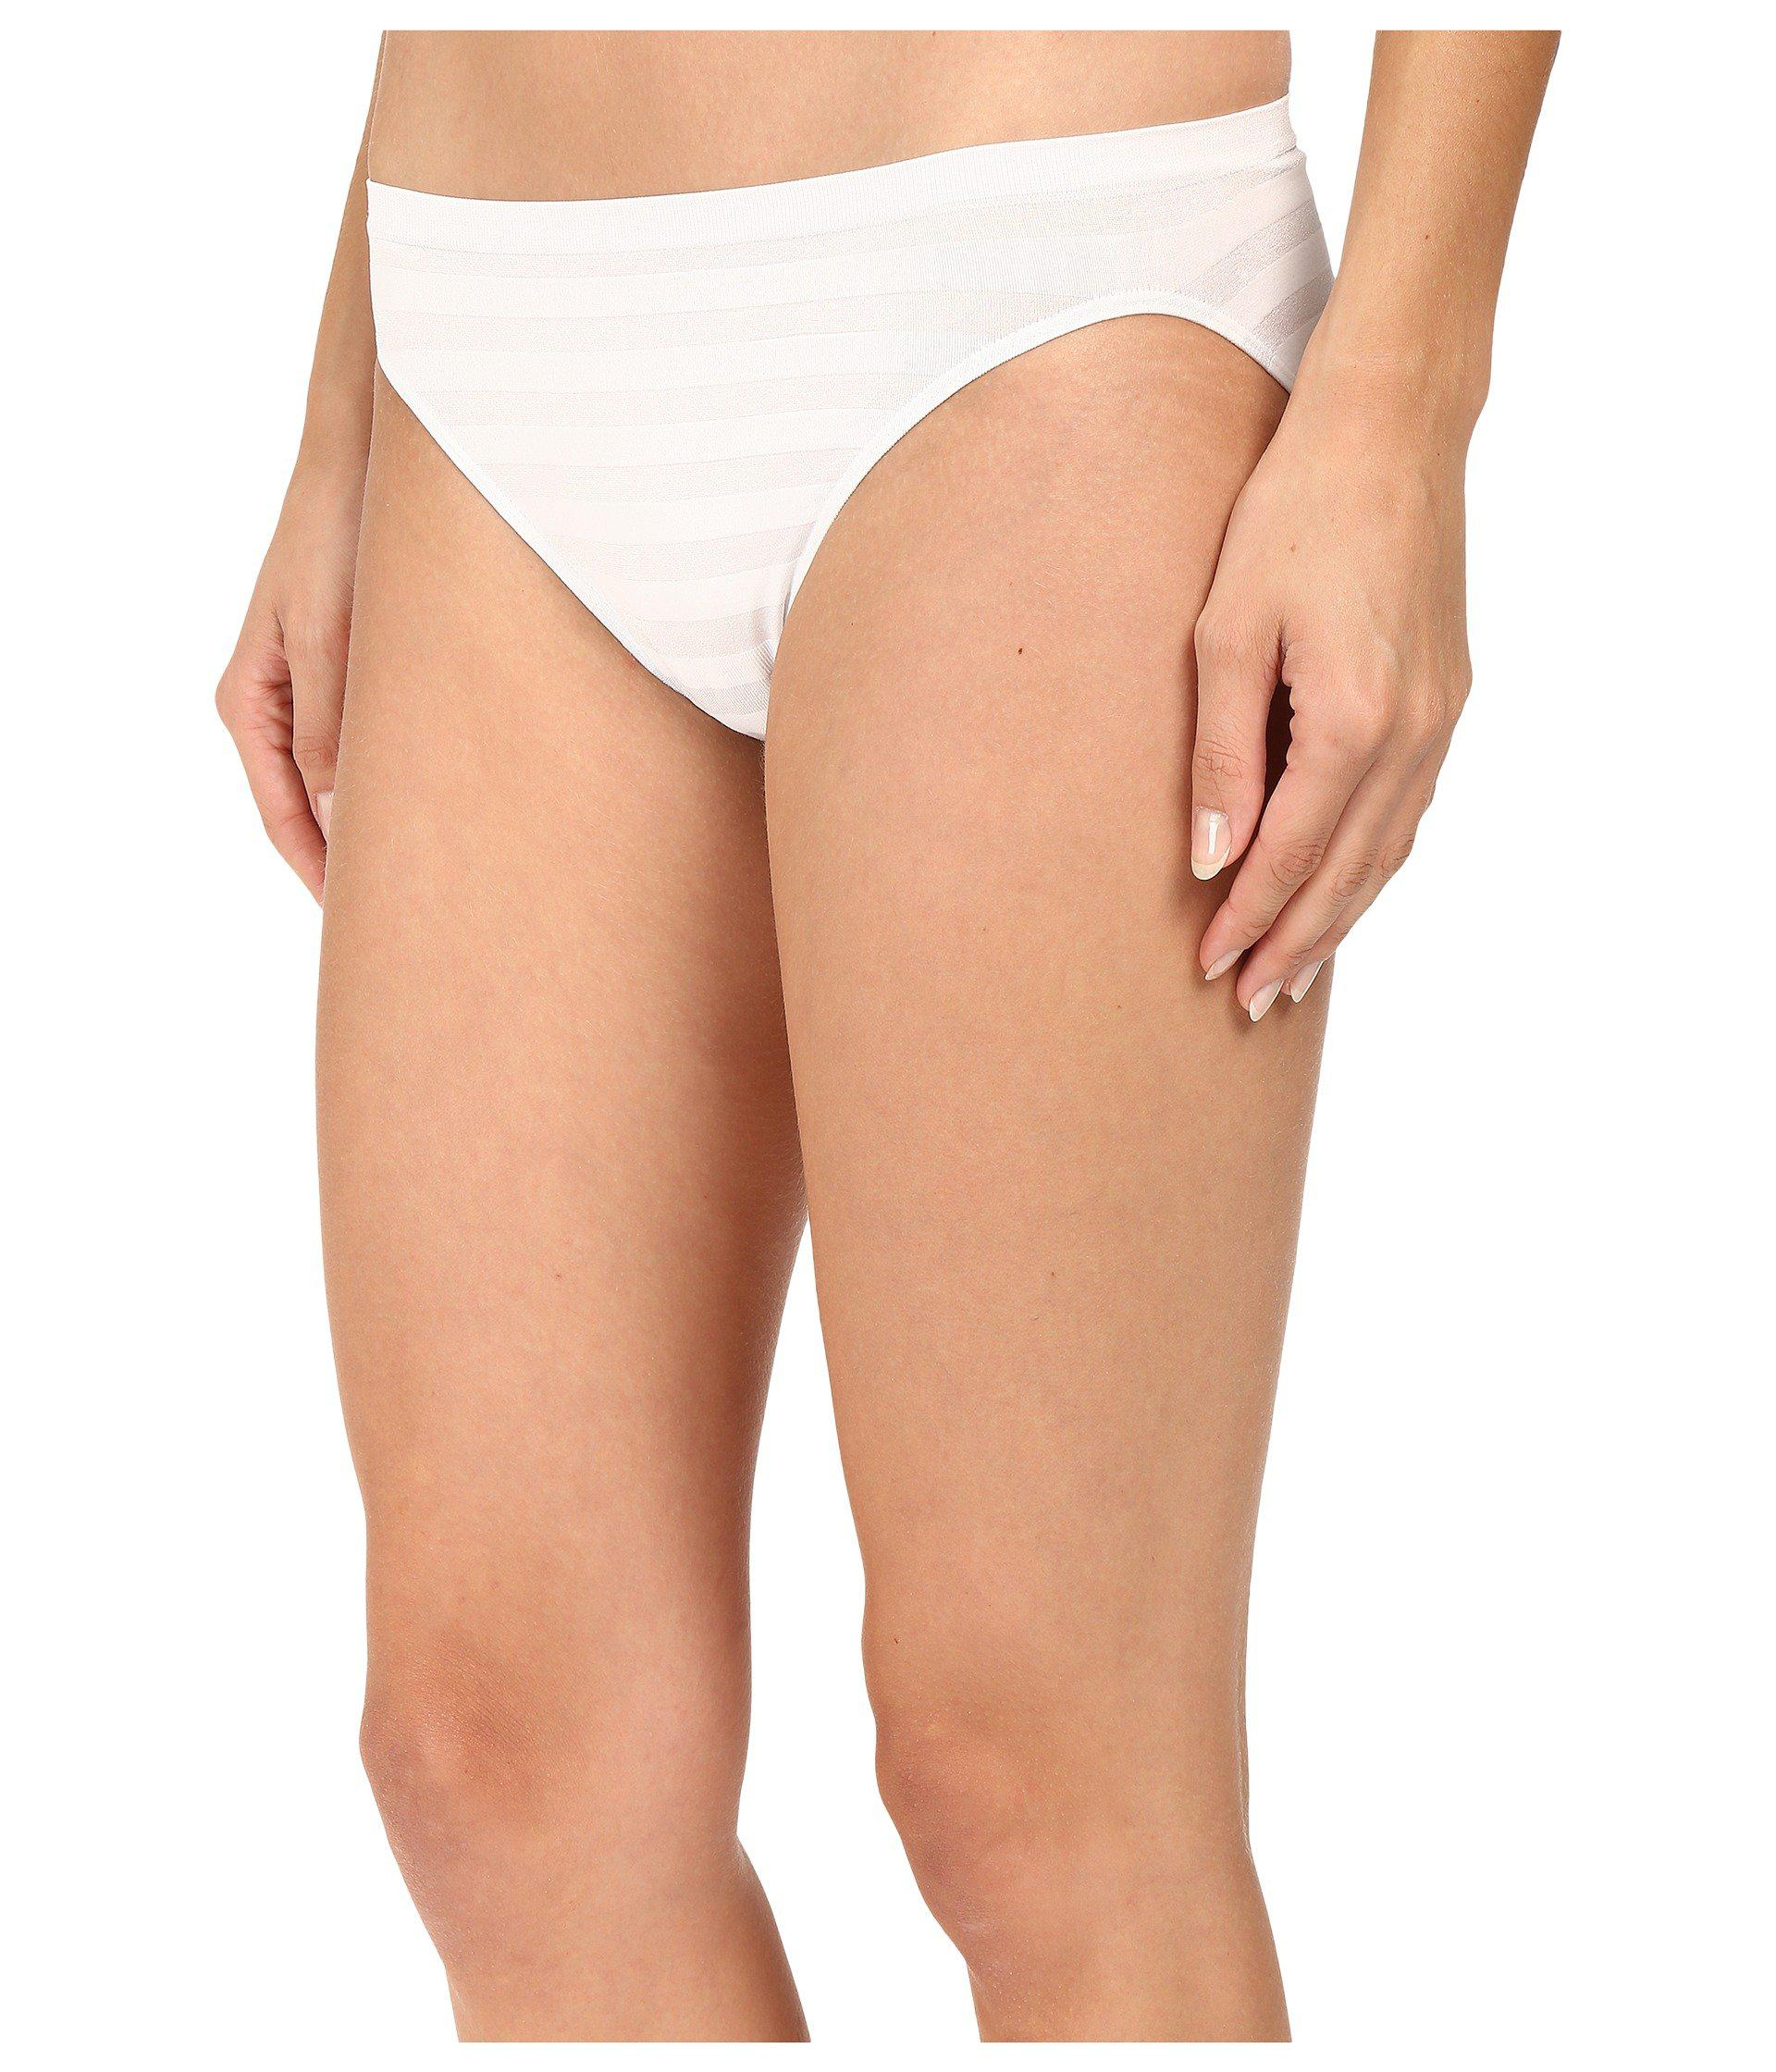 20a71050ebe7 Jockey Comfies(r) Matte Shine Bikini (white) Women's Underwear in White -  Lyst